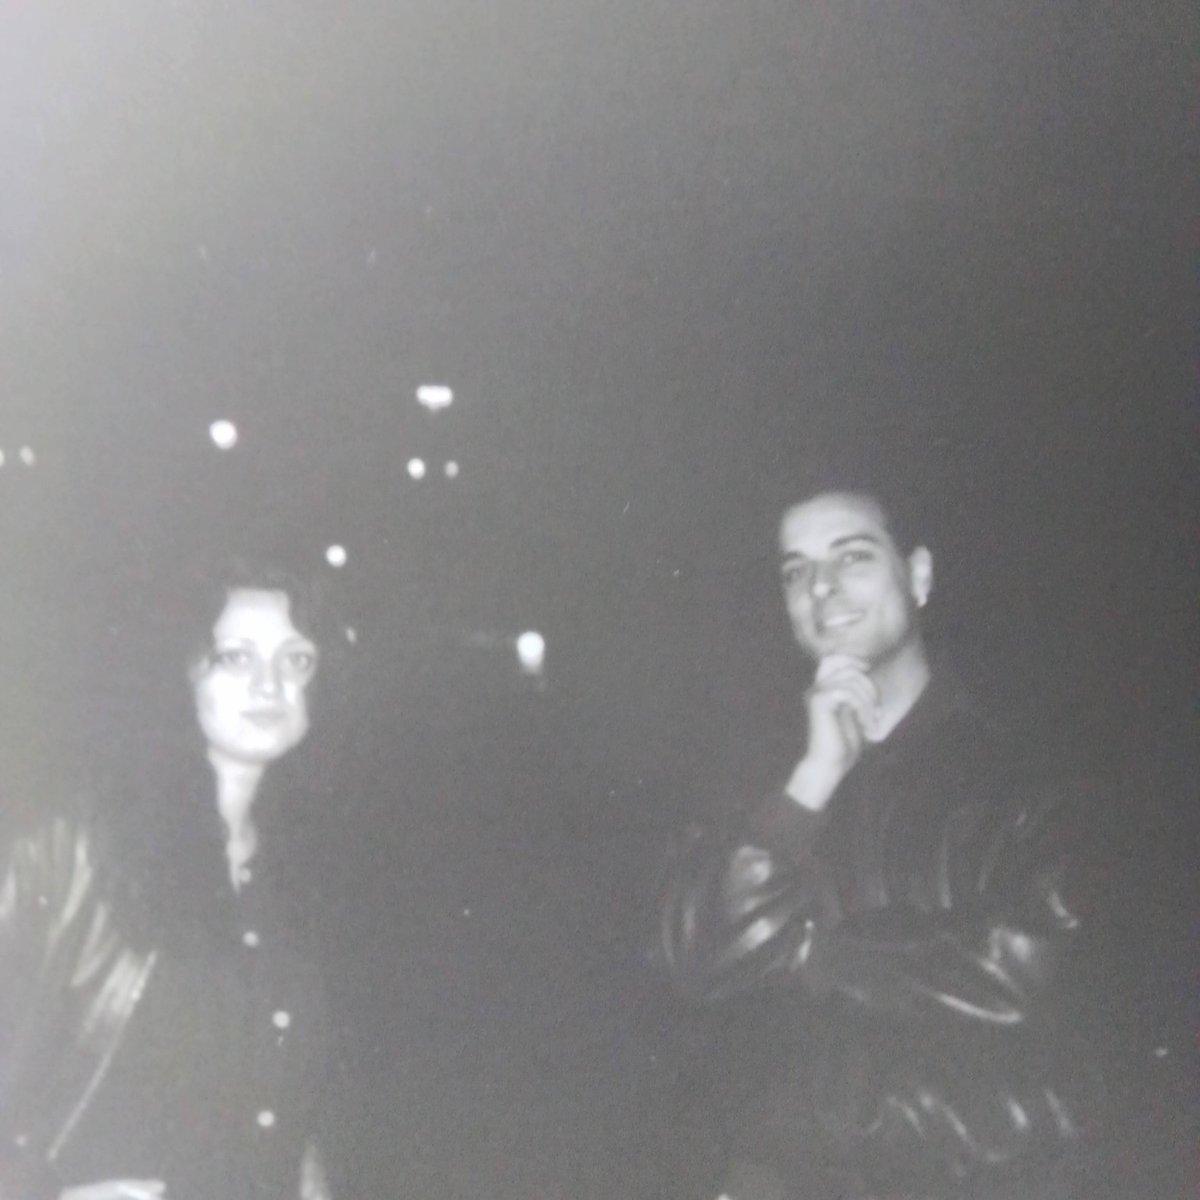 #Funk #guitar #indie #NewMusic #guitarist #Producer #international #radio #gfvip  #music #indiemusic #tv #remix #electronicmusic #guitarmonster #DJ #indieradio #elecropop #dance #rtArtBoost  ITALIAN GRAFFITI #90s: on the street with friends